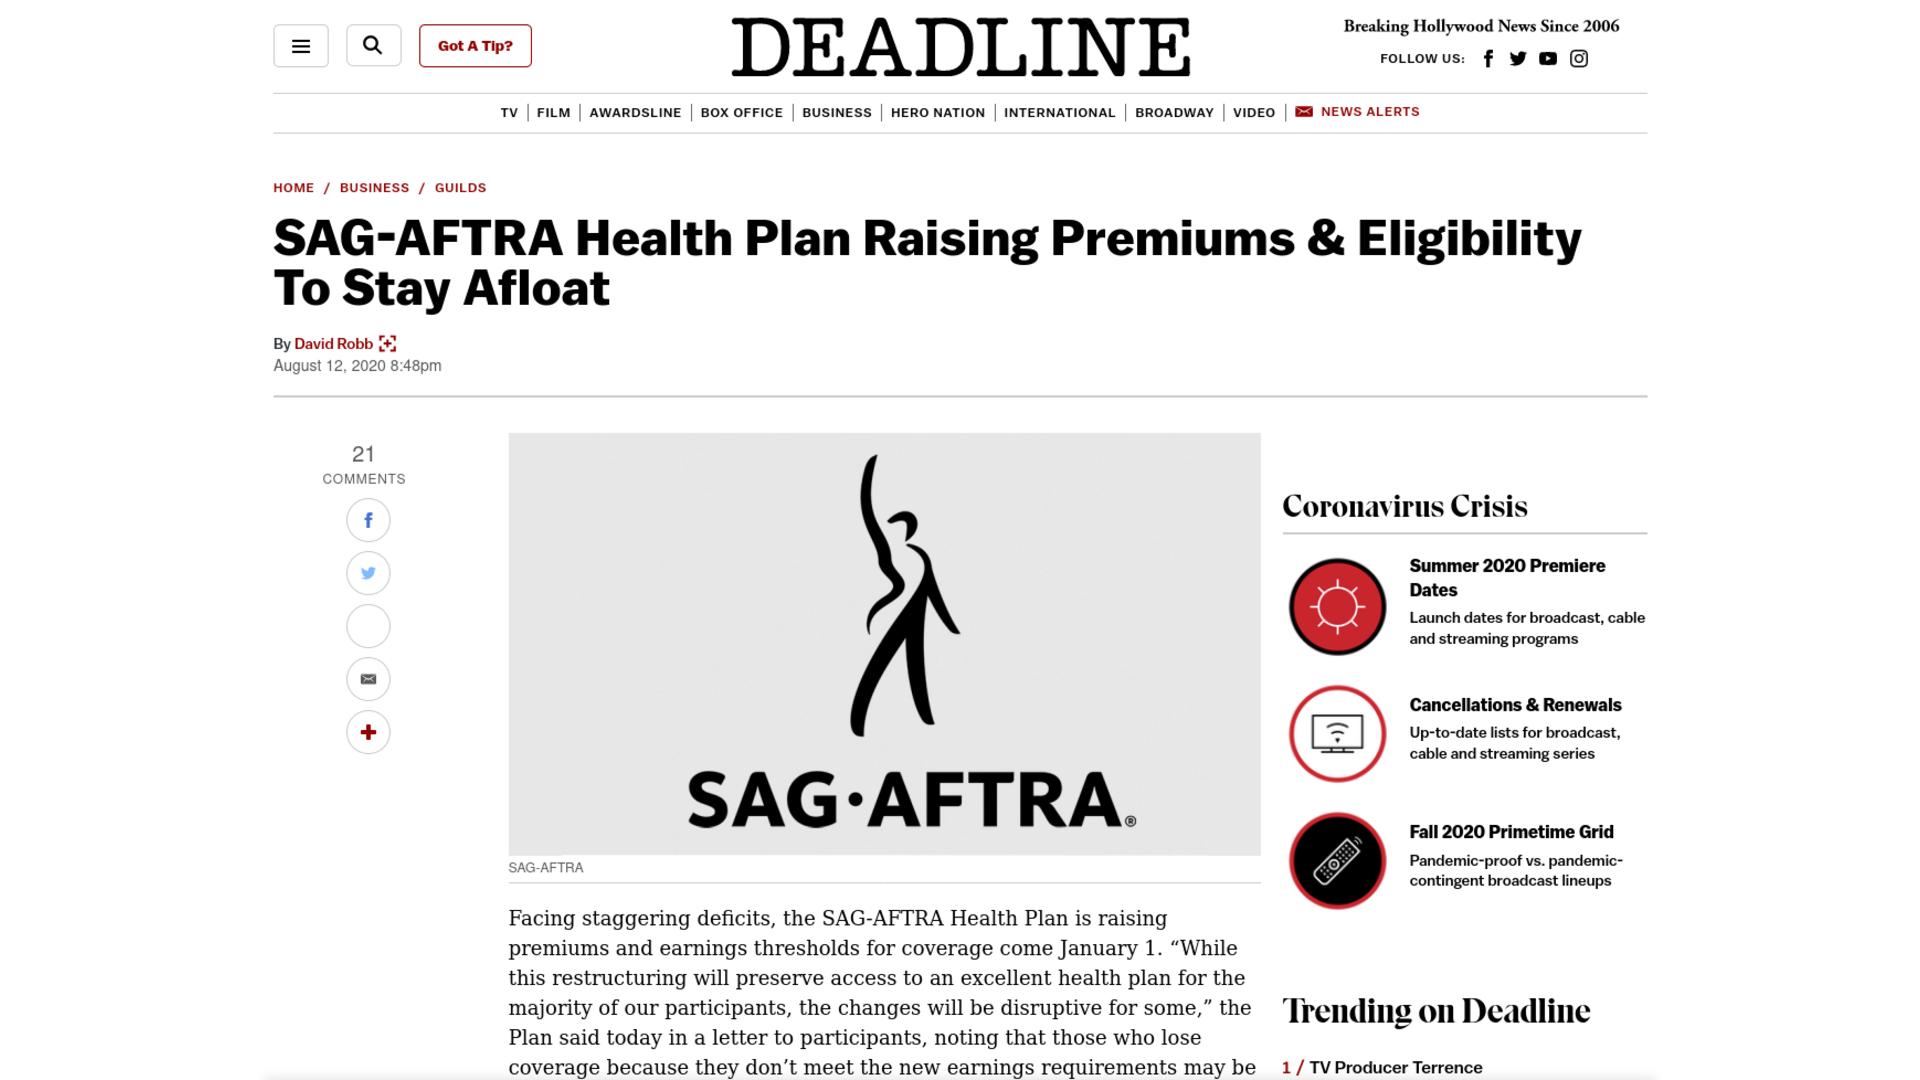 Fairness Rocks News SAG-AFTRA Health Plan Raising Premiums & Eligibility To Stay Afloat